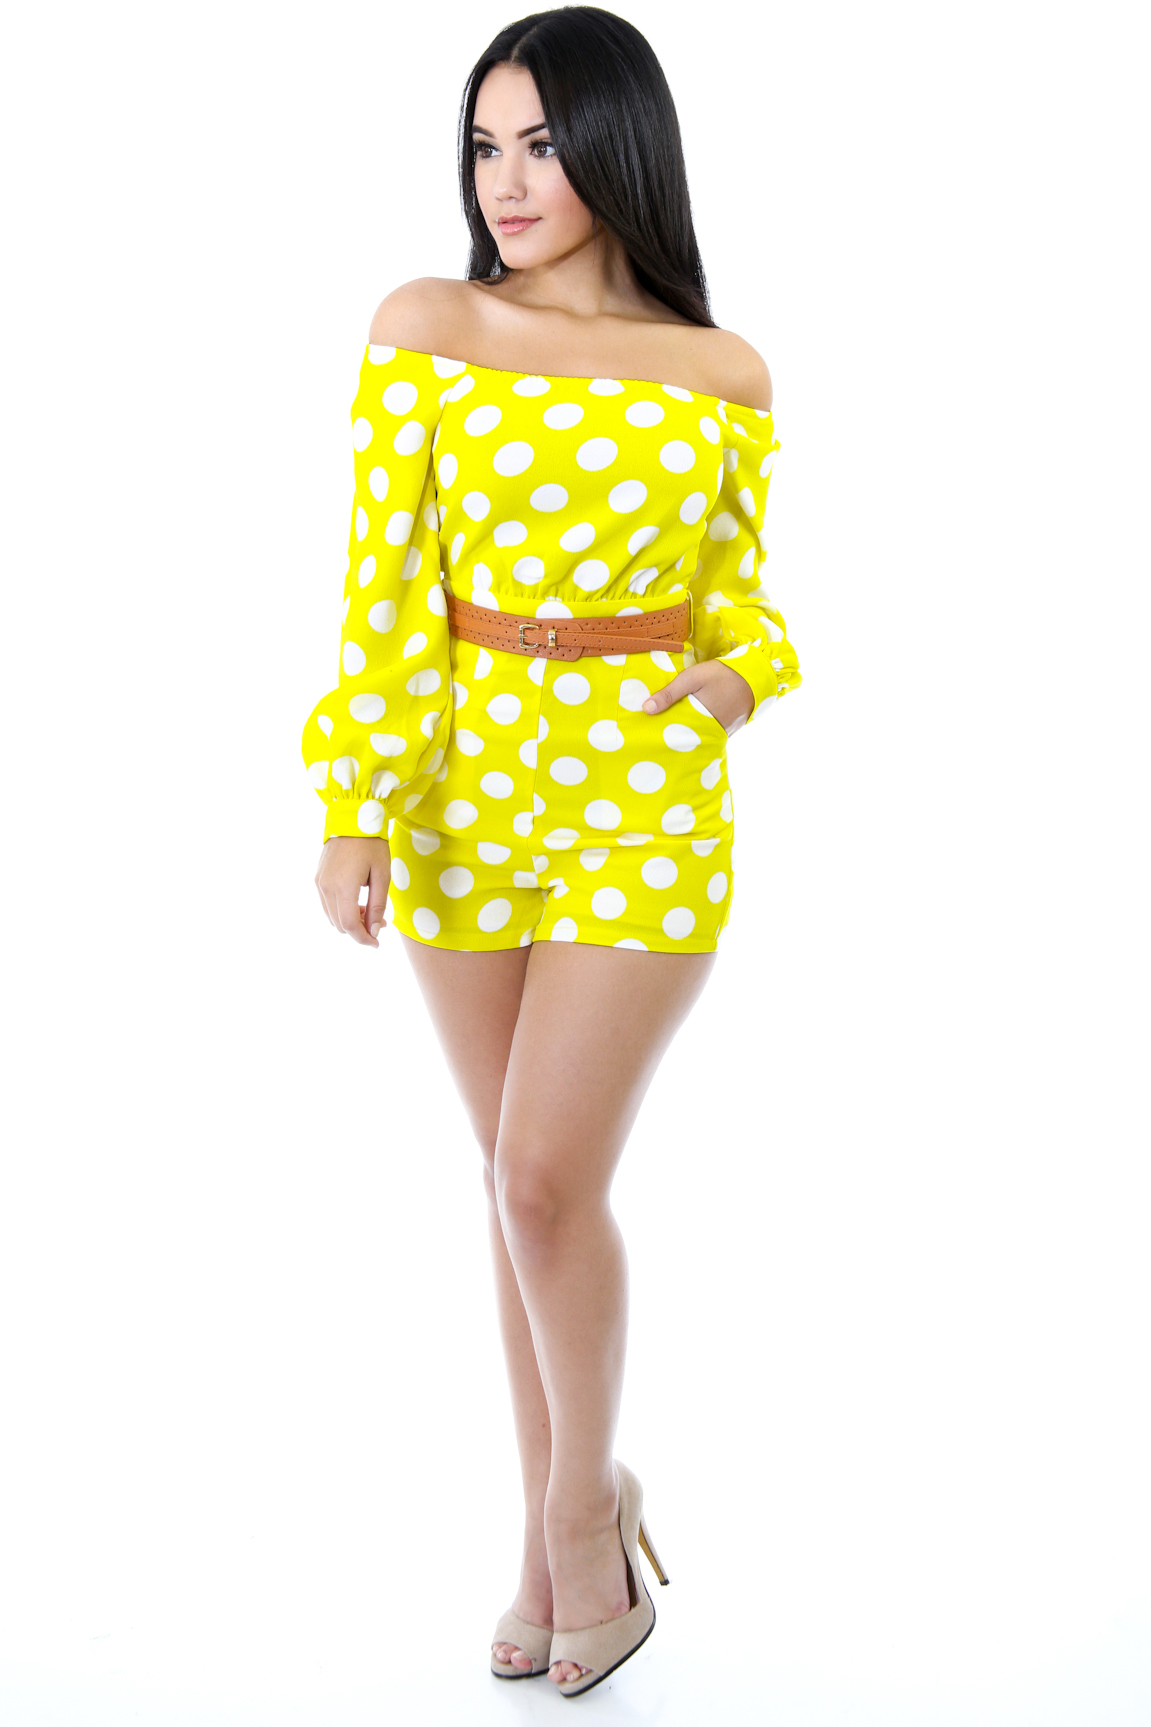 Polka Dot Romper u00b7 Stylo Clothing and Shoes u00b7 Online Store Powered by Storenvy